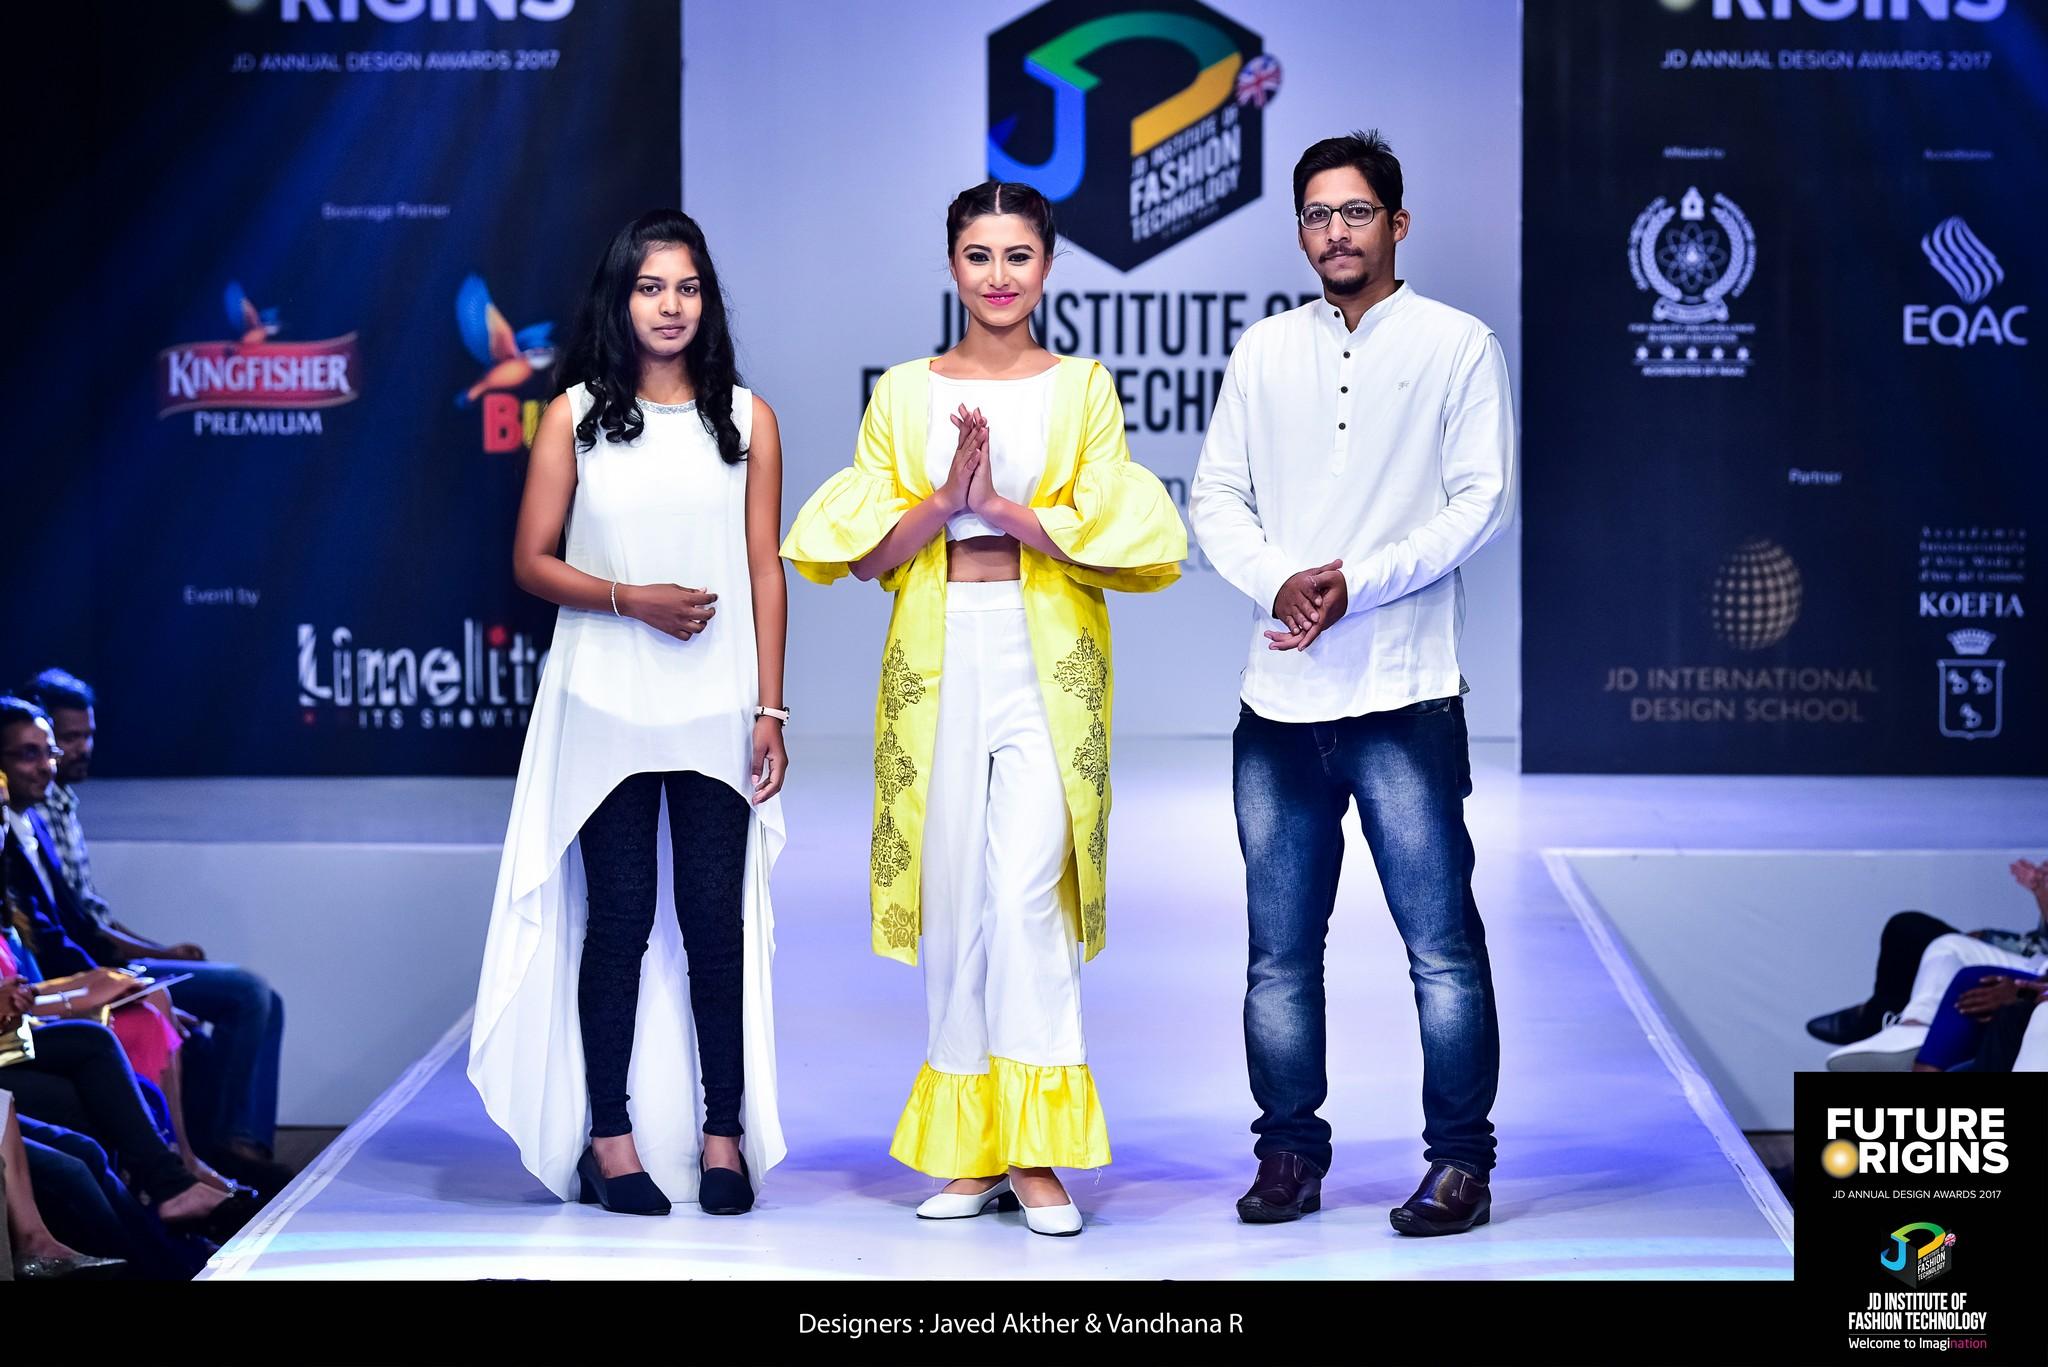 Rustic - Future Origin - JD Annual Design Awards 2017 | Photography : Jerin Nath (@jerin_nath) rustic - Rustic     Future Origin     JD Annual Design Awards 2017 11 - Rustic – Future Origin – JD Annual Design Awards 2017